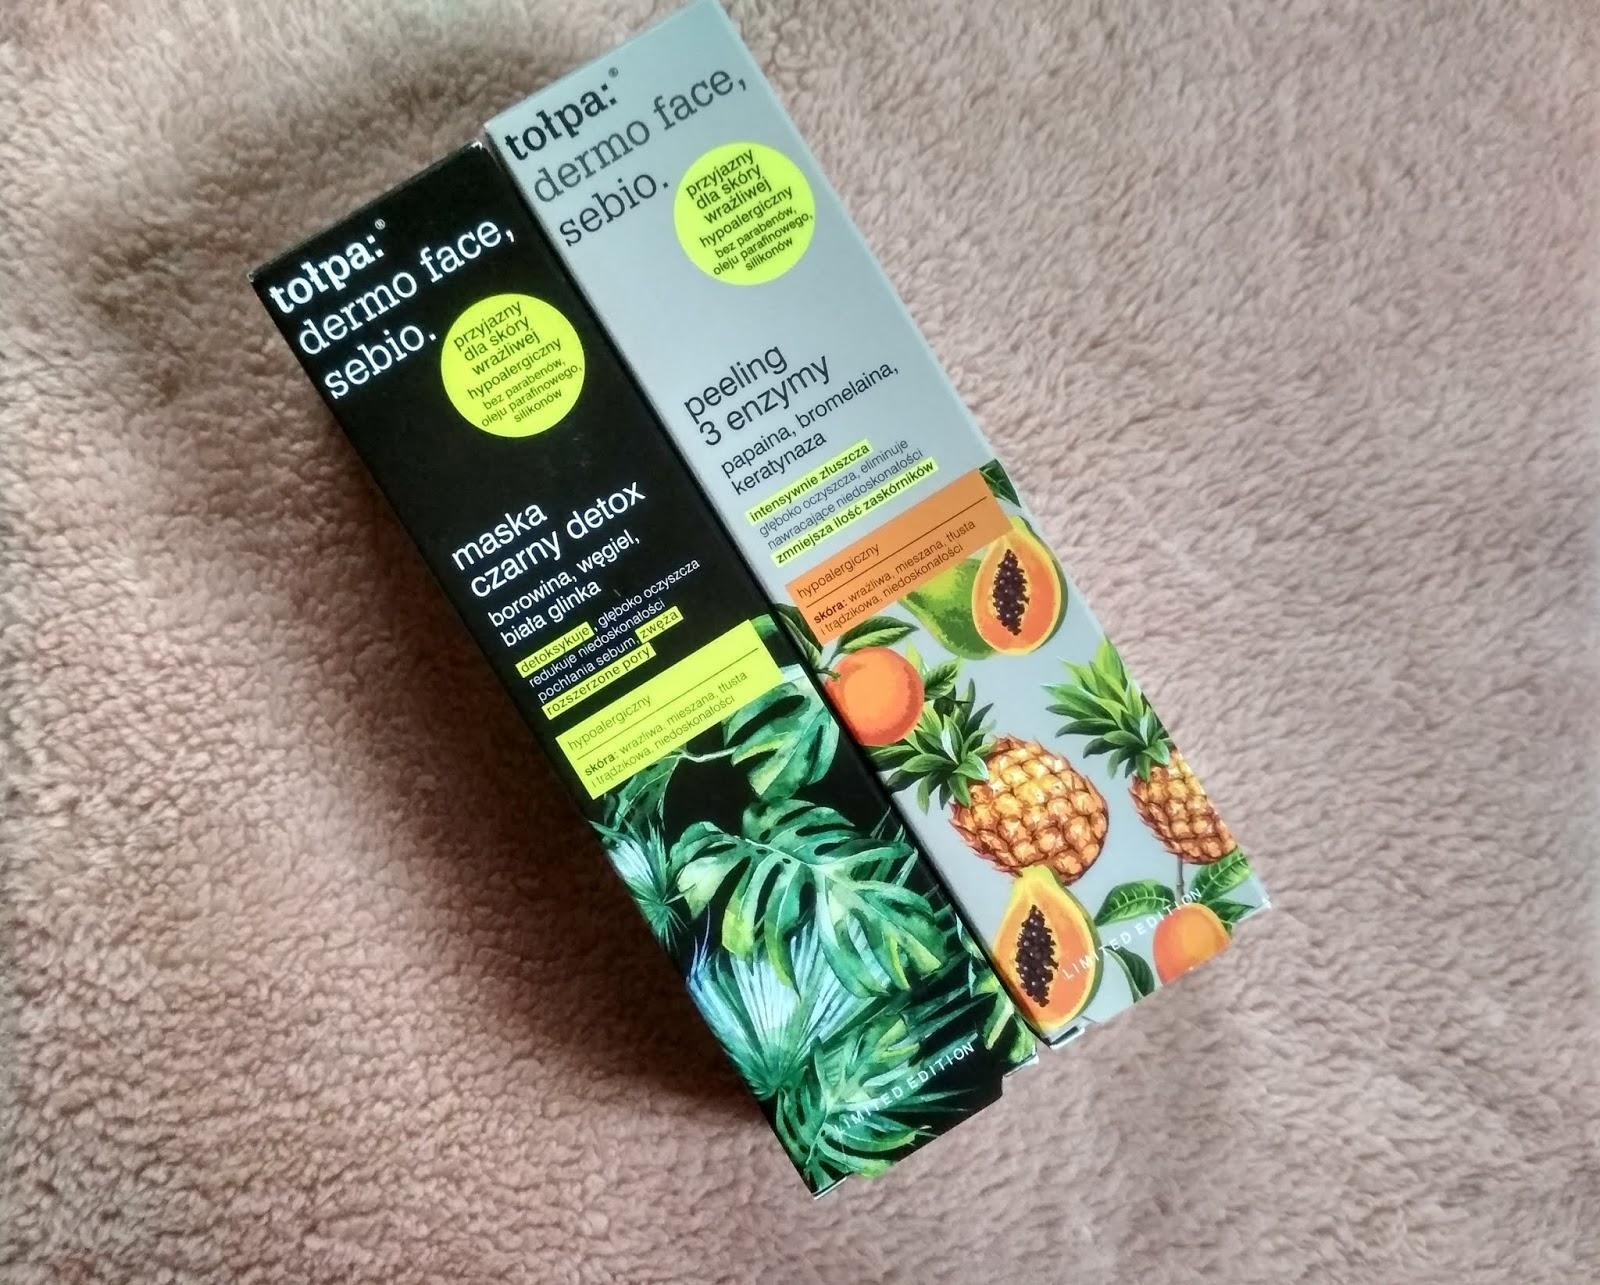 Recenzja - Tołpa Dermo Face, sebio peeling 3 enzymy i maska czarny detox | N. o kosmetykach